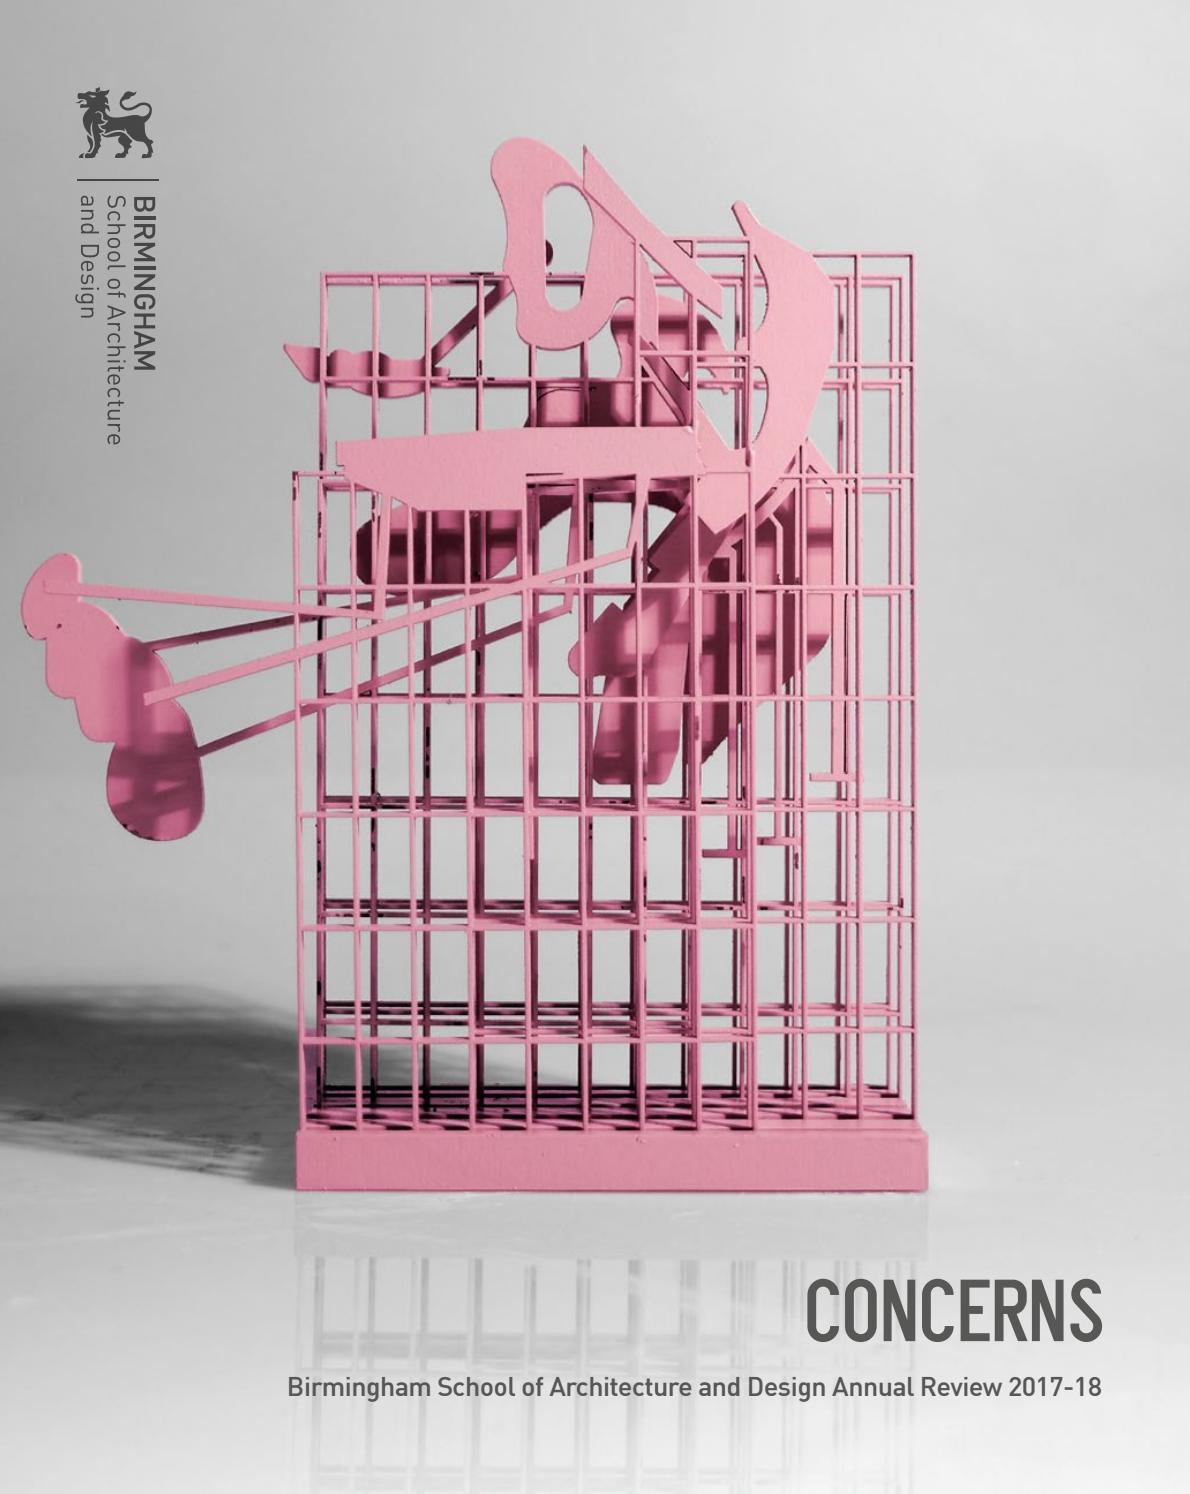 Concerns 2017-18, Birmingham School of Architecture and